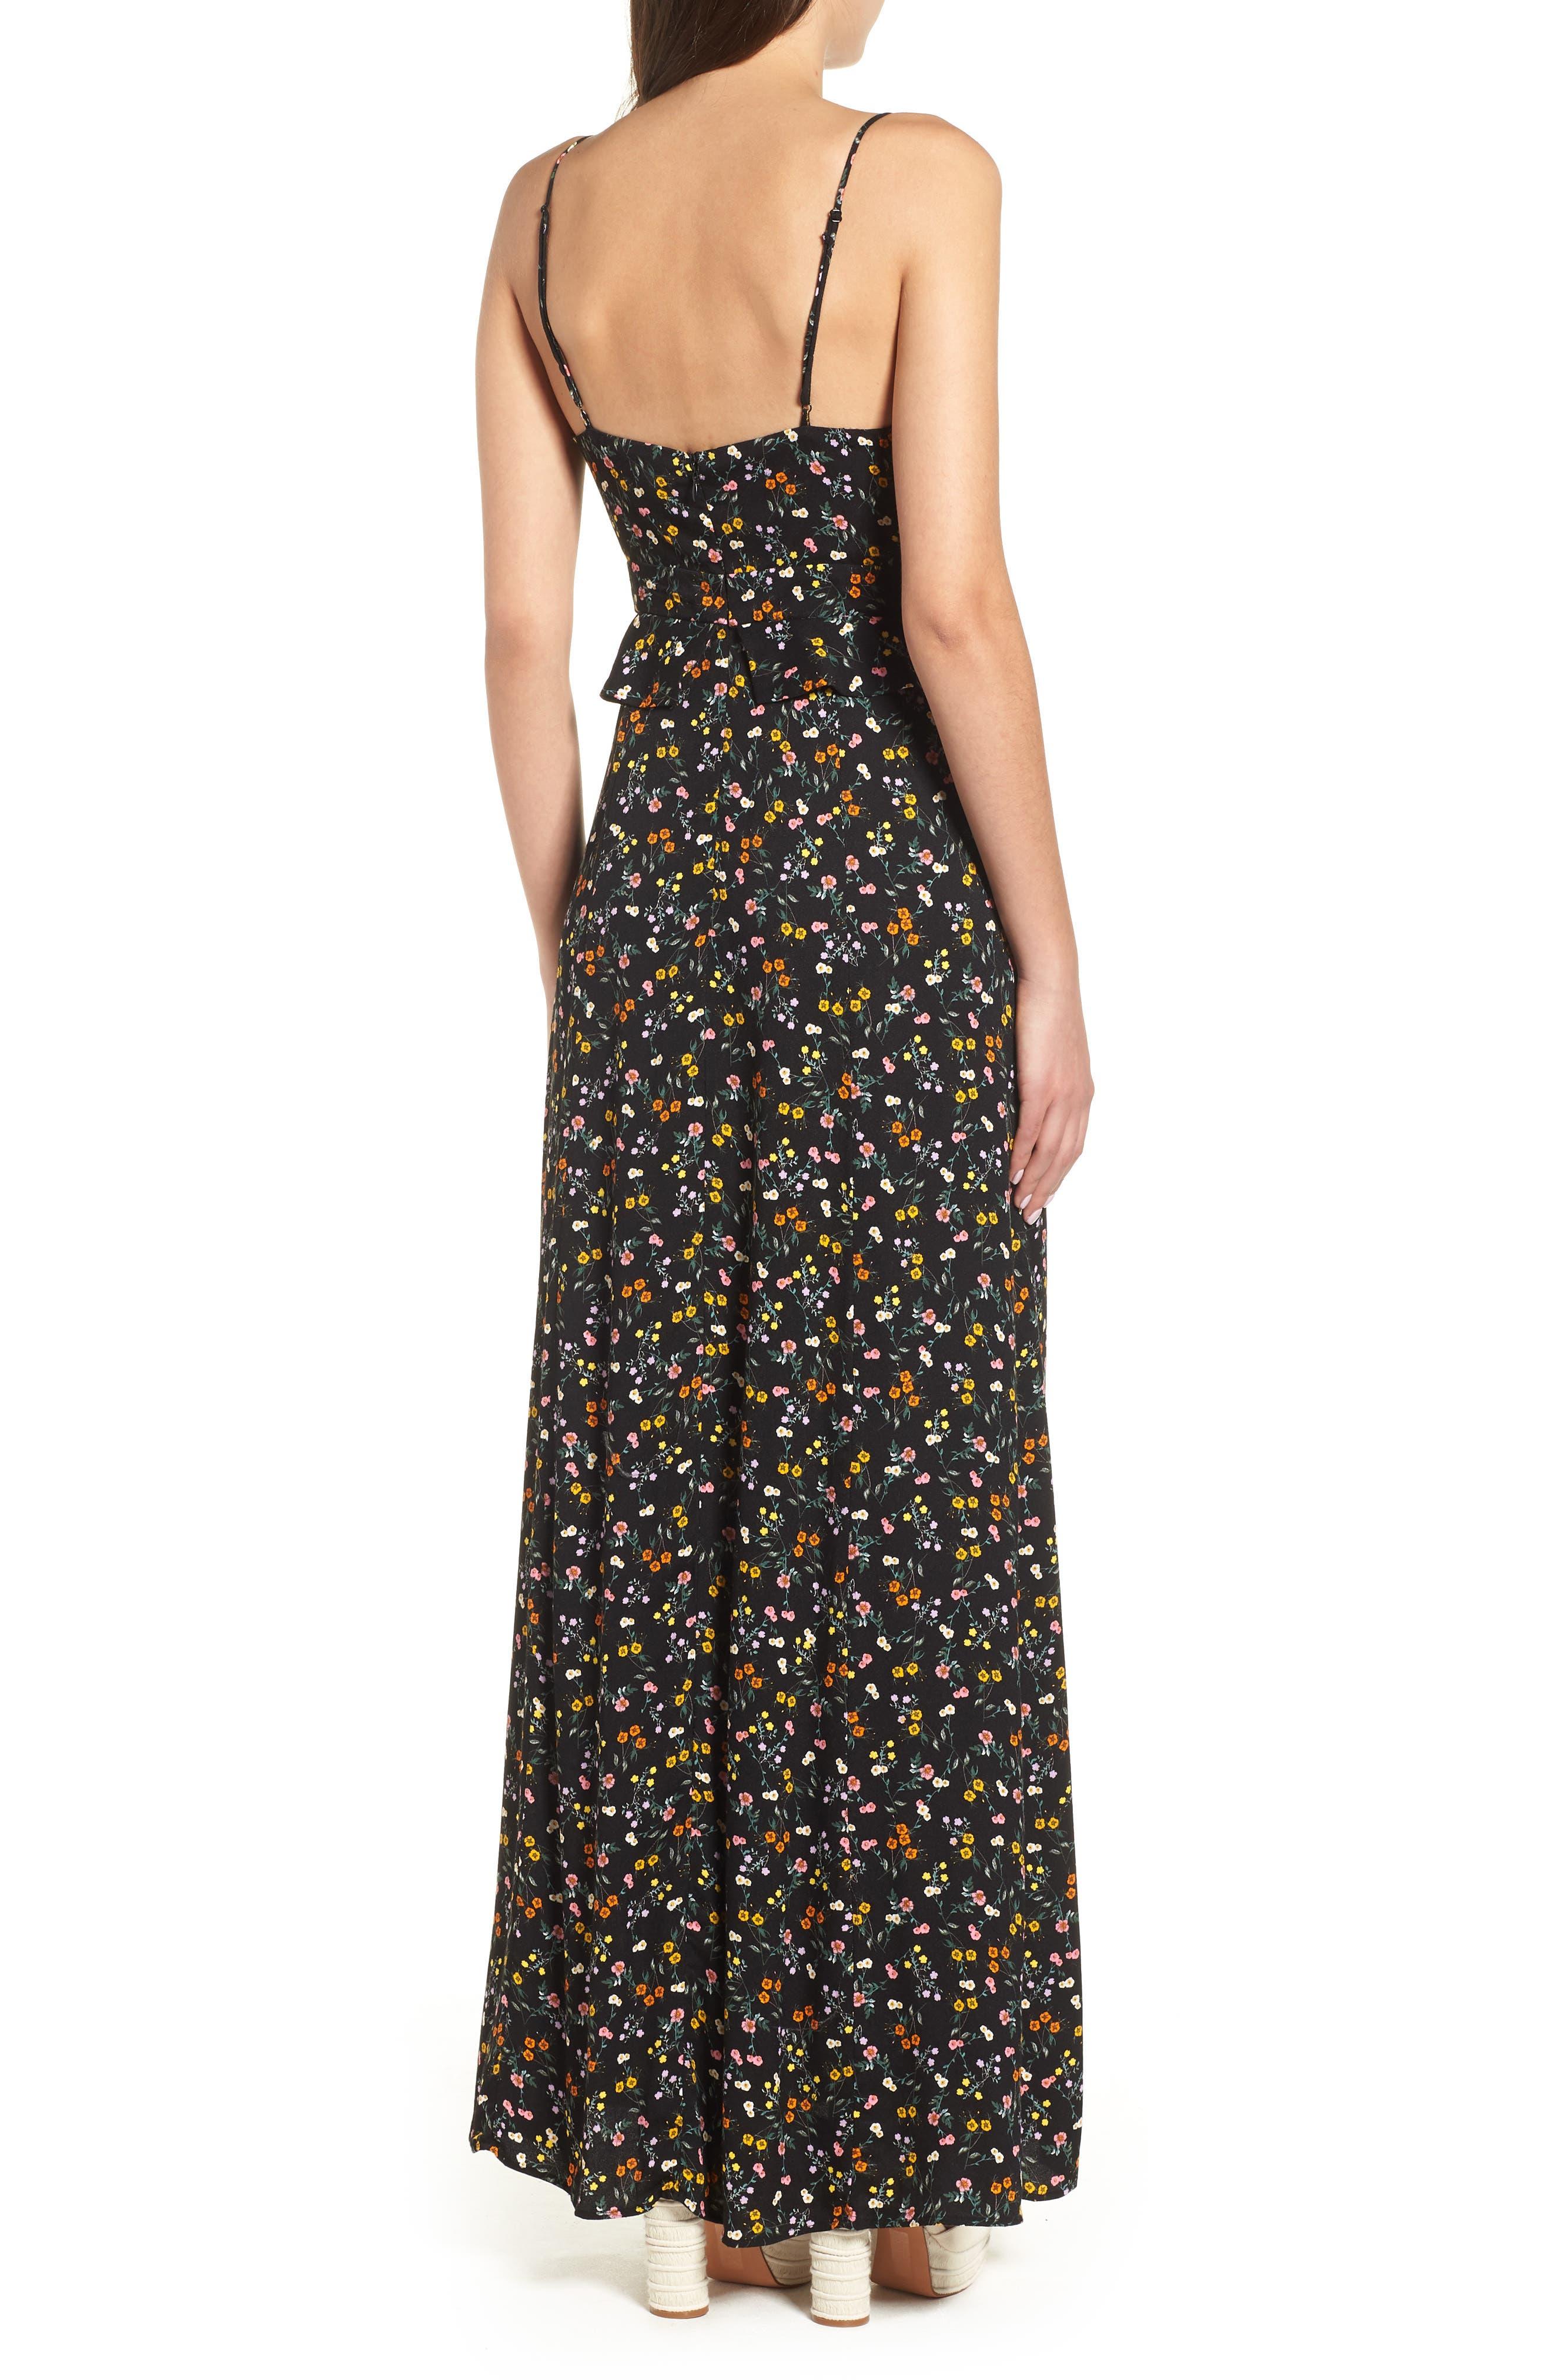 Kiki Ruffle Maxi Dress,                             Alternate thumbnail 2, color,                             Noir Petite Fleur